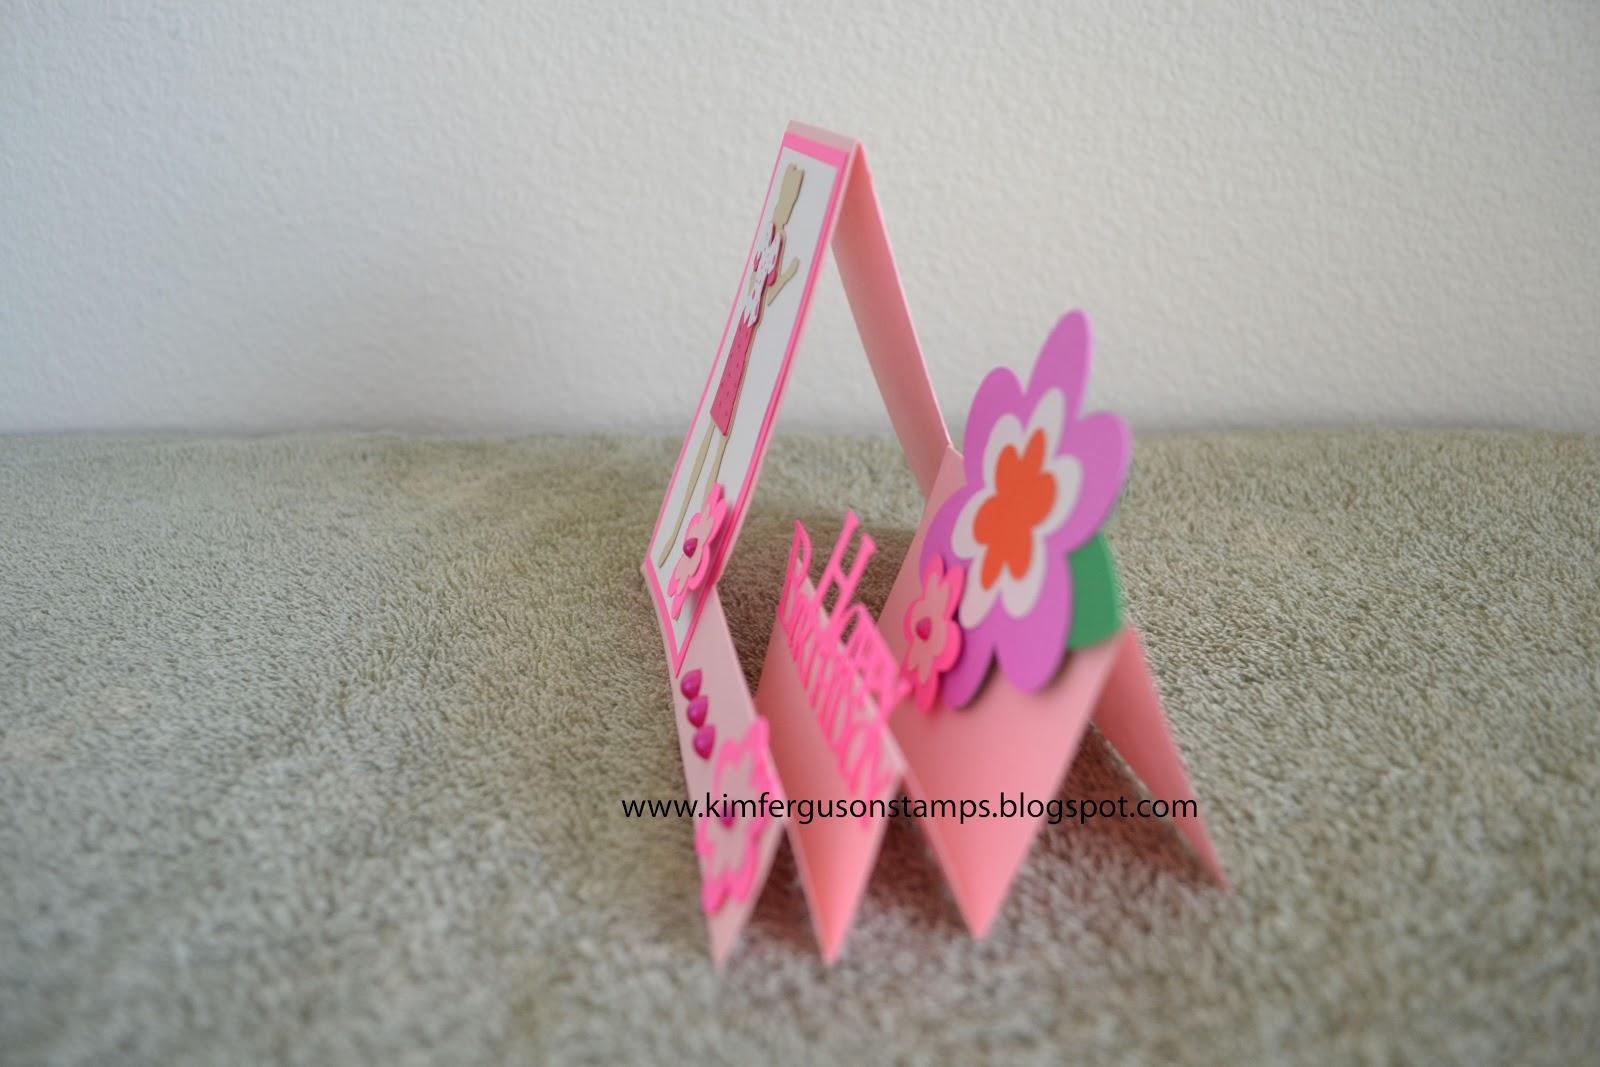 http://1.bp.blogspot.com/-g2UGbJkH-UY/UCFHglaty_I/AAAAAAAAADw/VL90x52p22A/s1600/8-2012+Cricut+Happy+Birthday+sideview.jpg